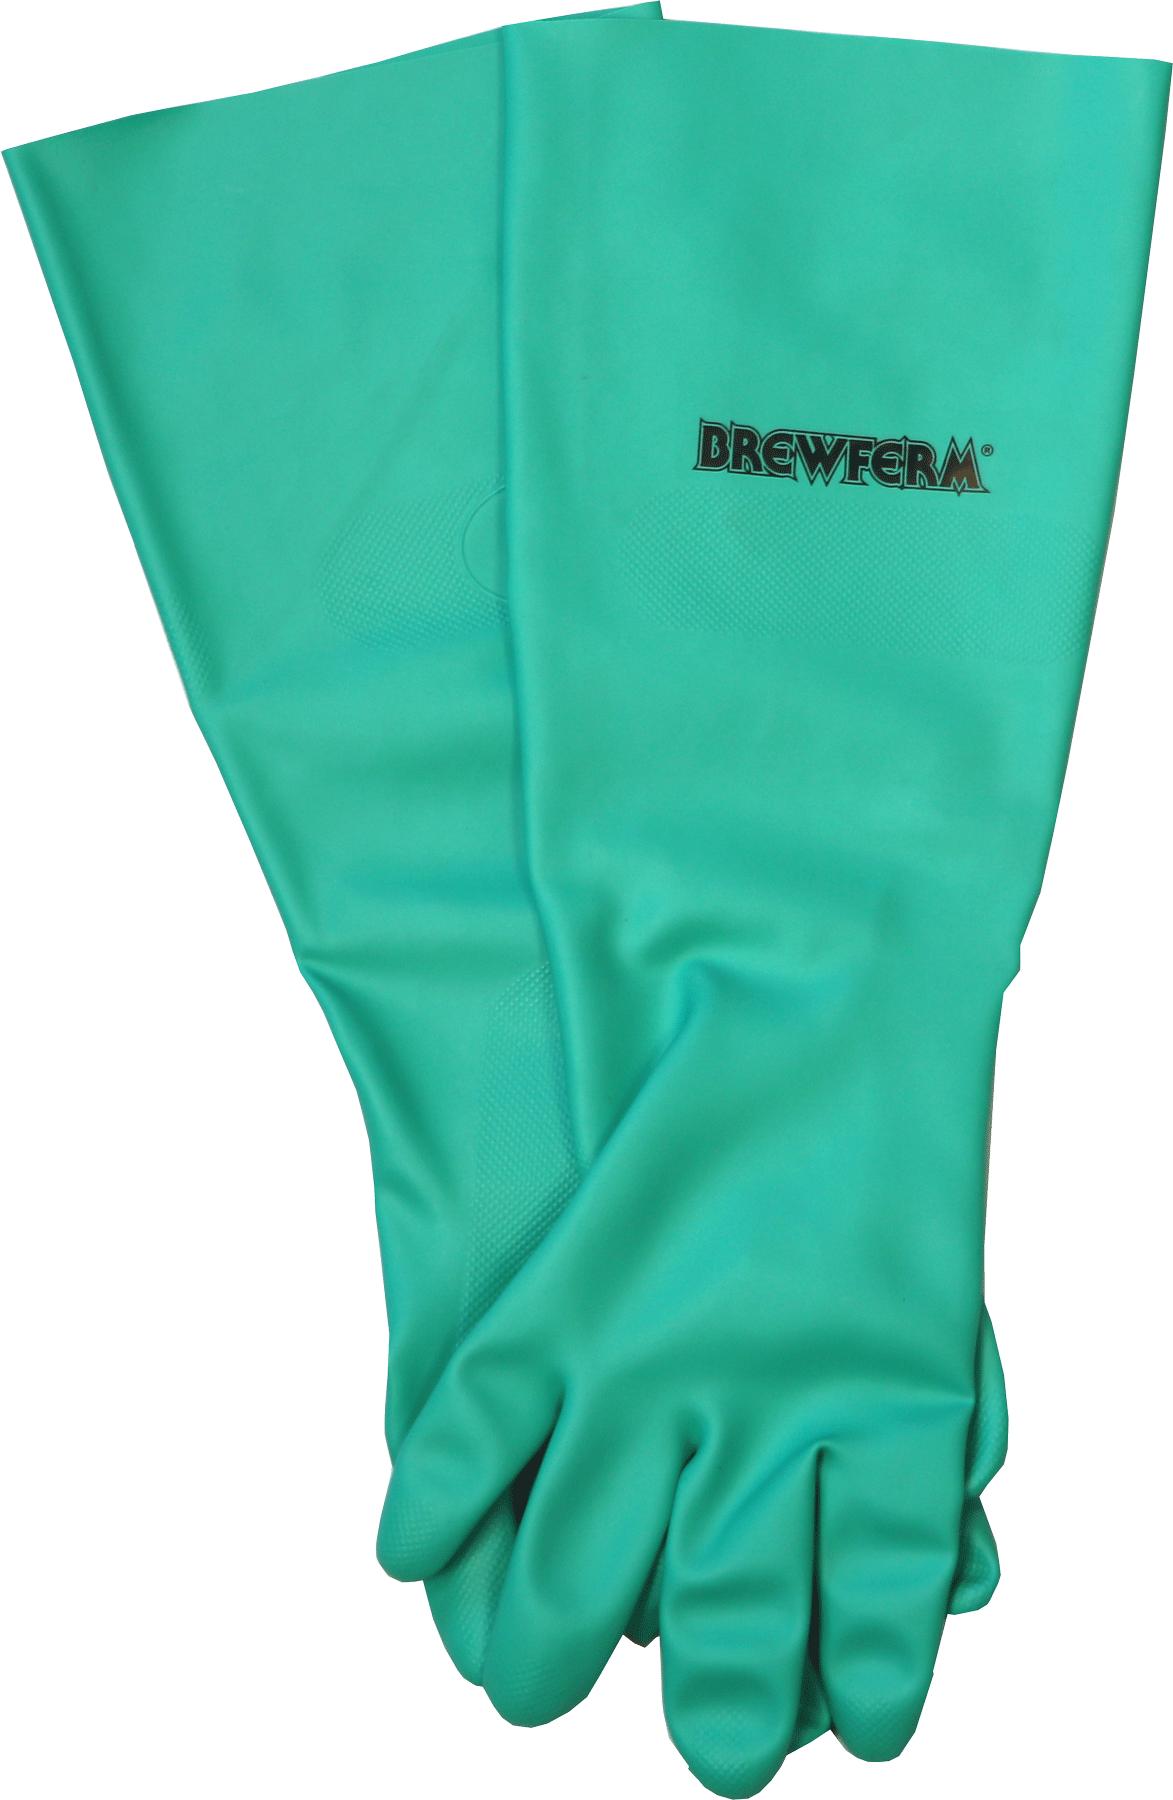 Gants de brassage Brewferm - Taille 8 (M)